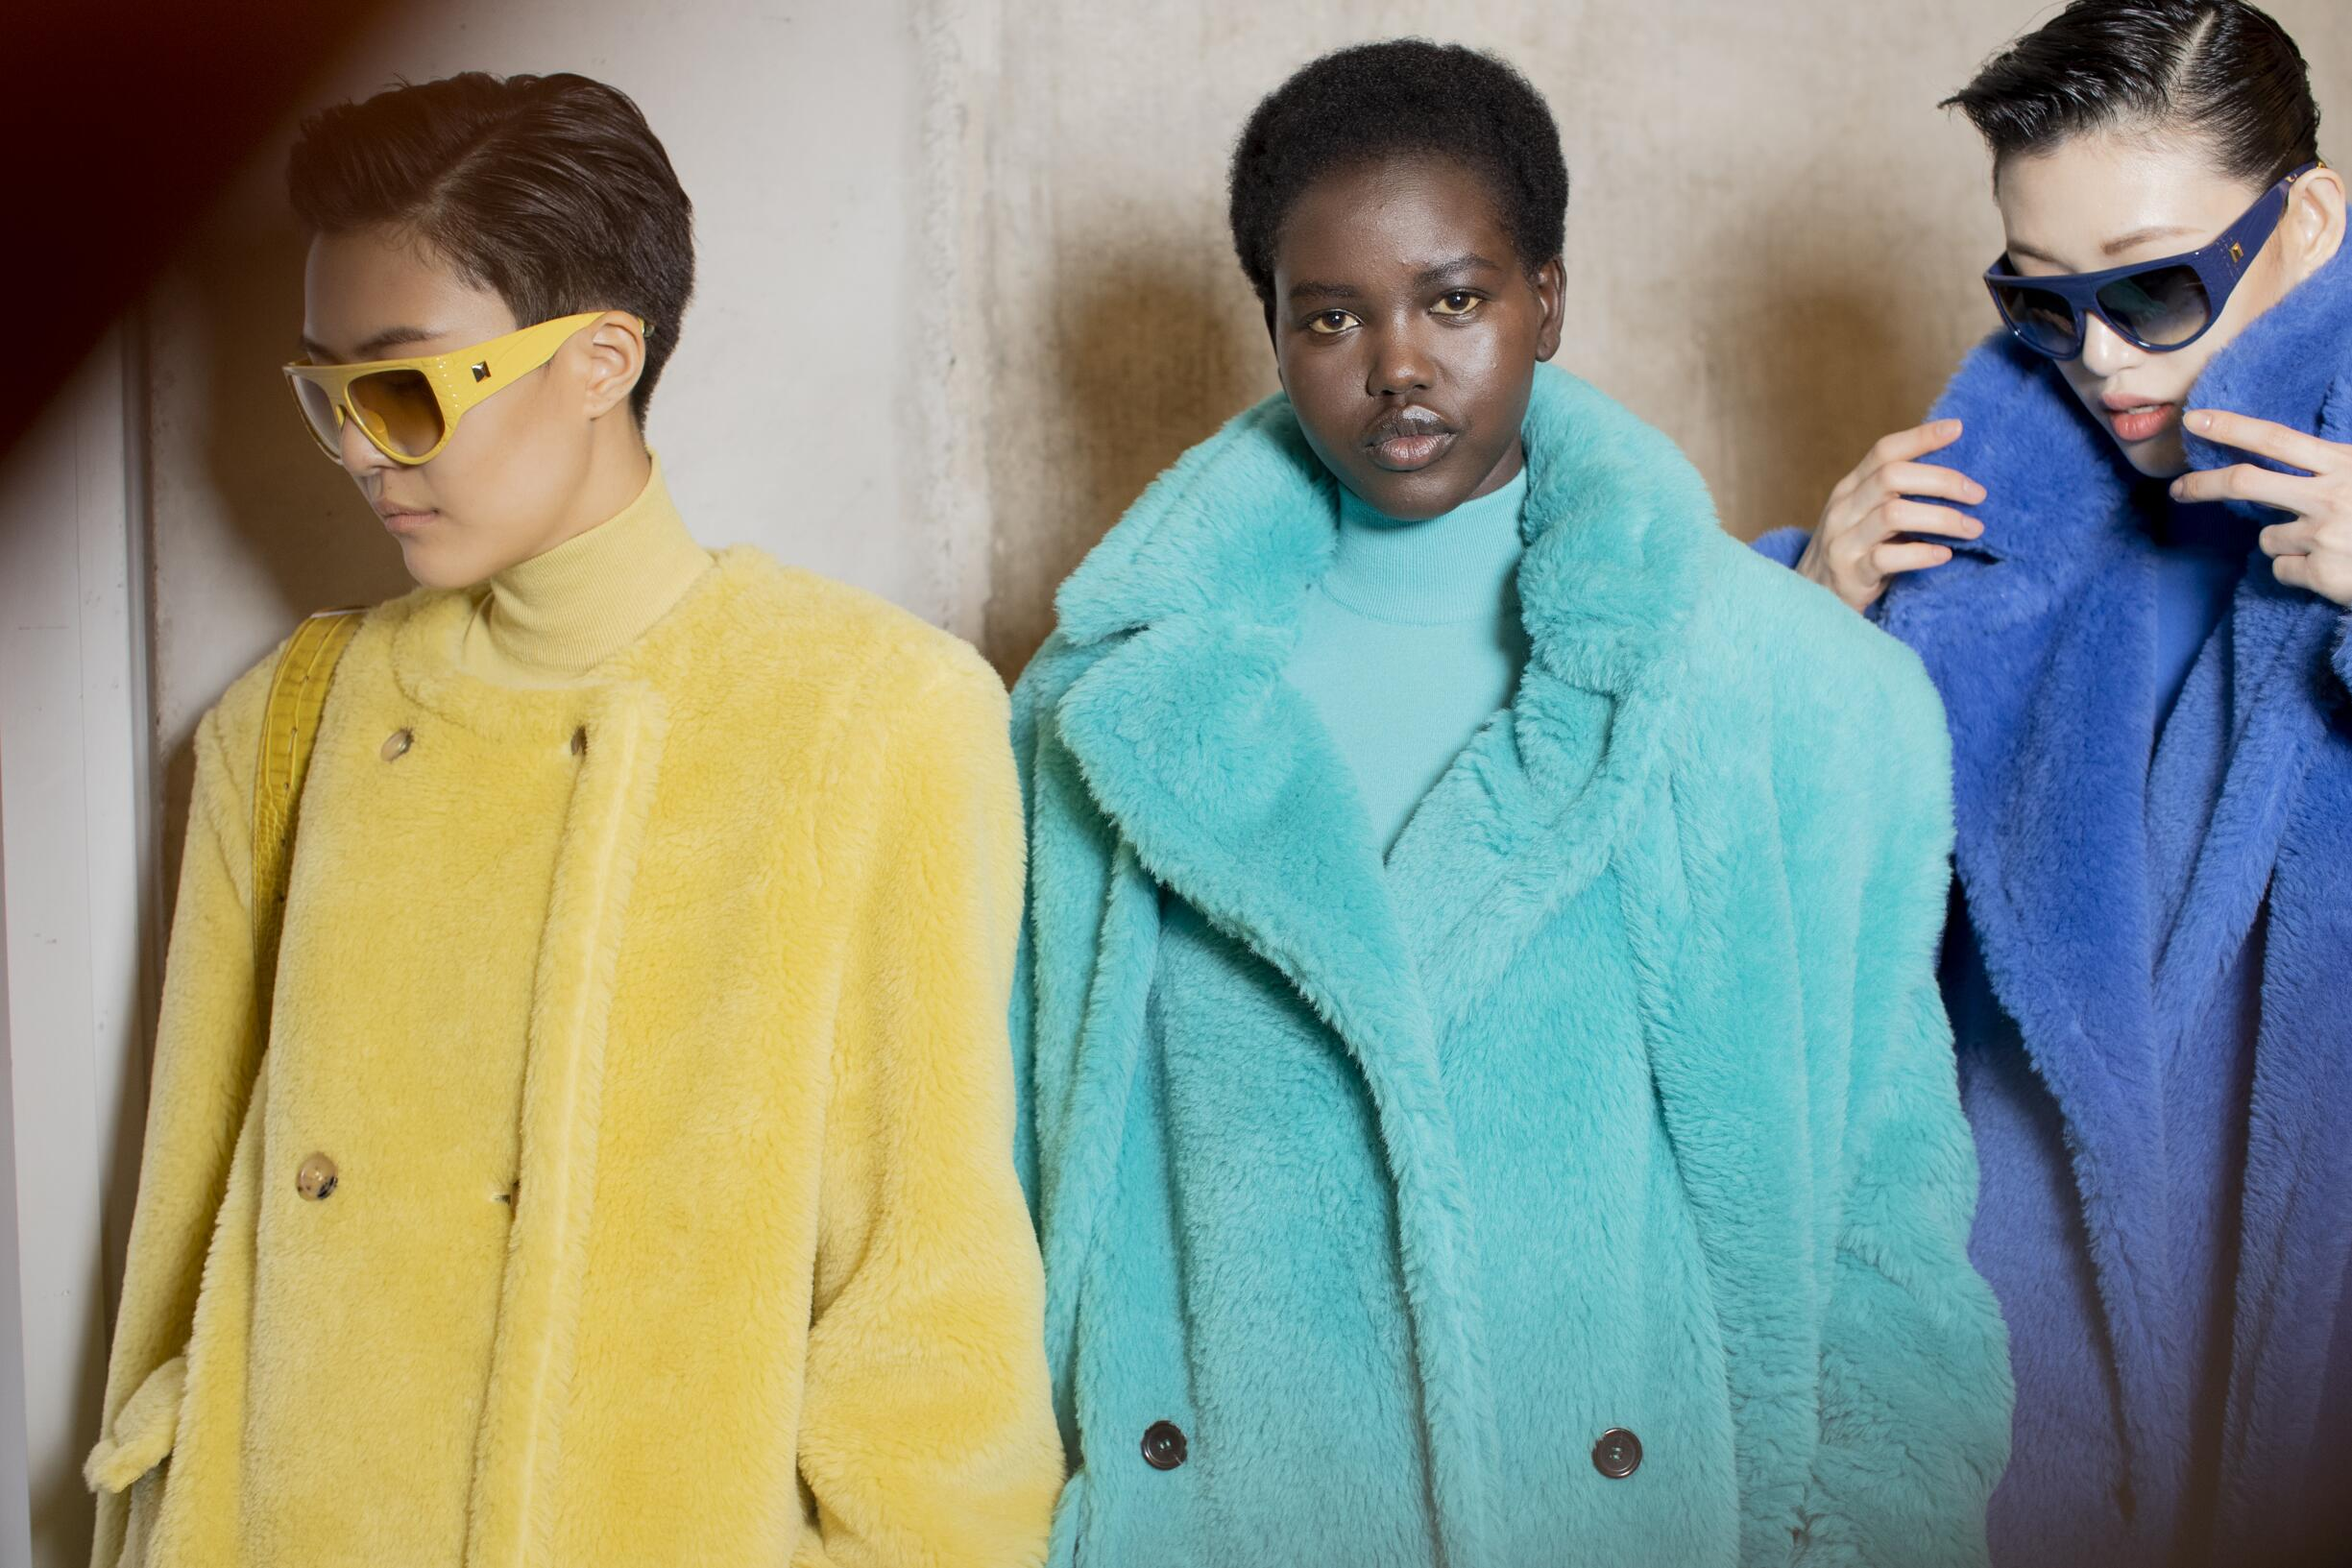 Models Fall Winter 2019 Backstage Max Mara